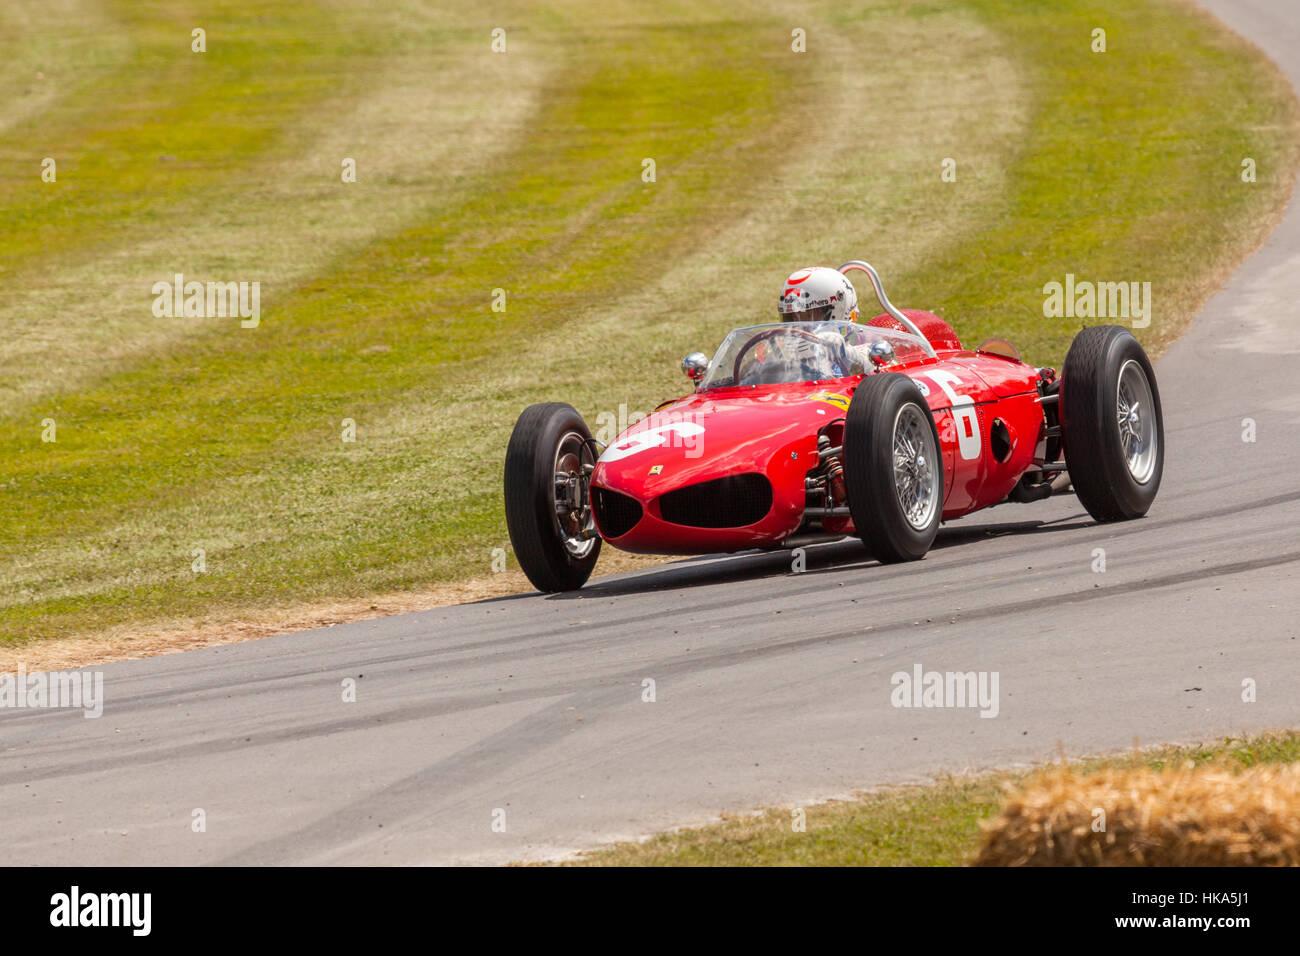 Ferrari historic racing car at Goodwood Festival of Speed 2014 - Stock Image